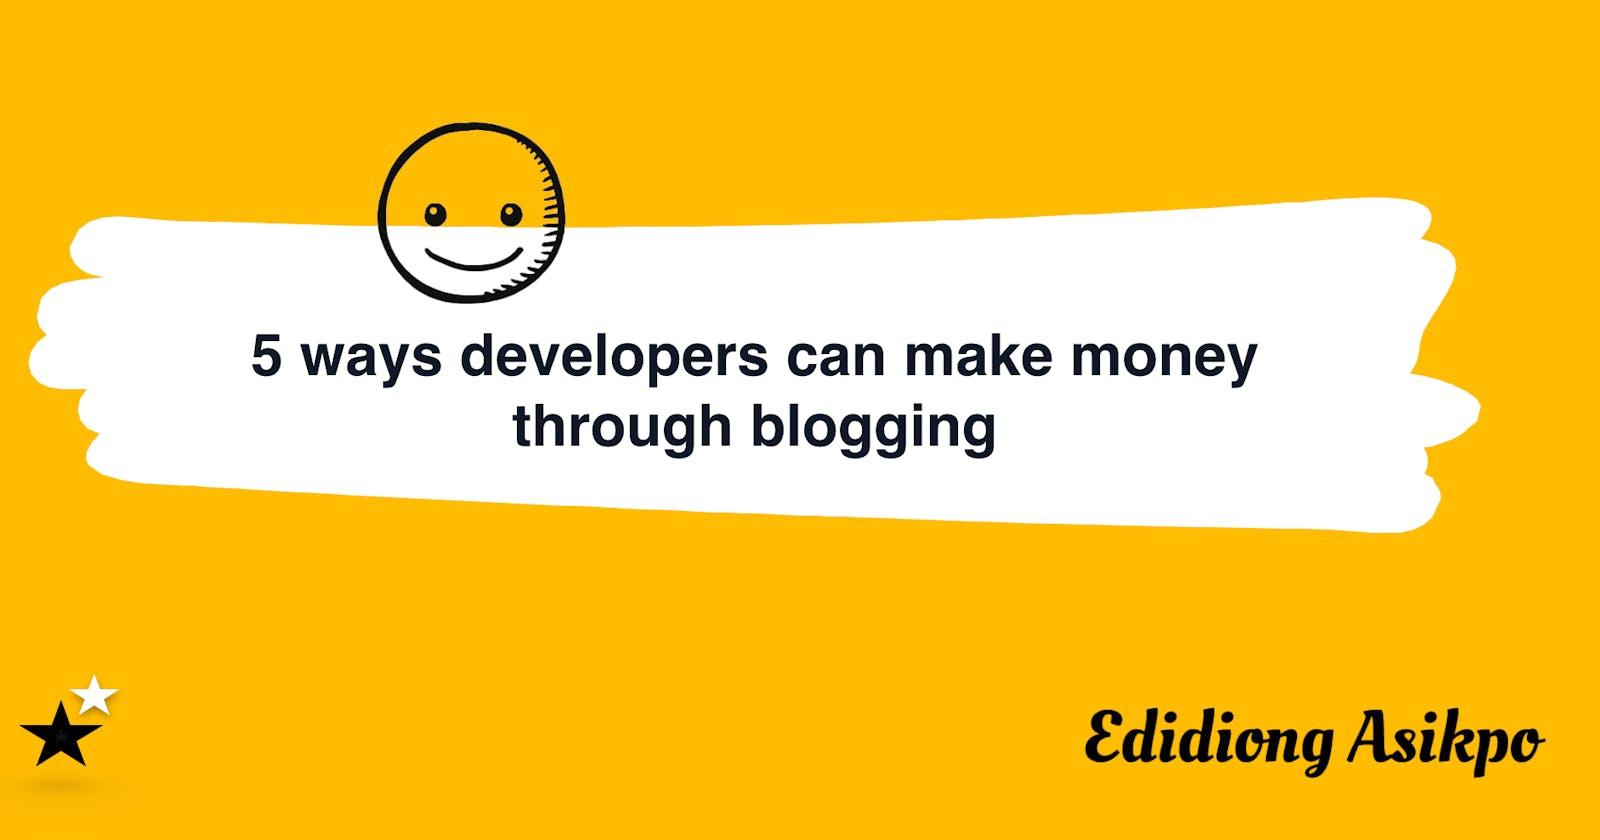 5 Ways Developers Can Make Money Through Blogging